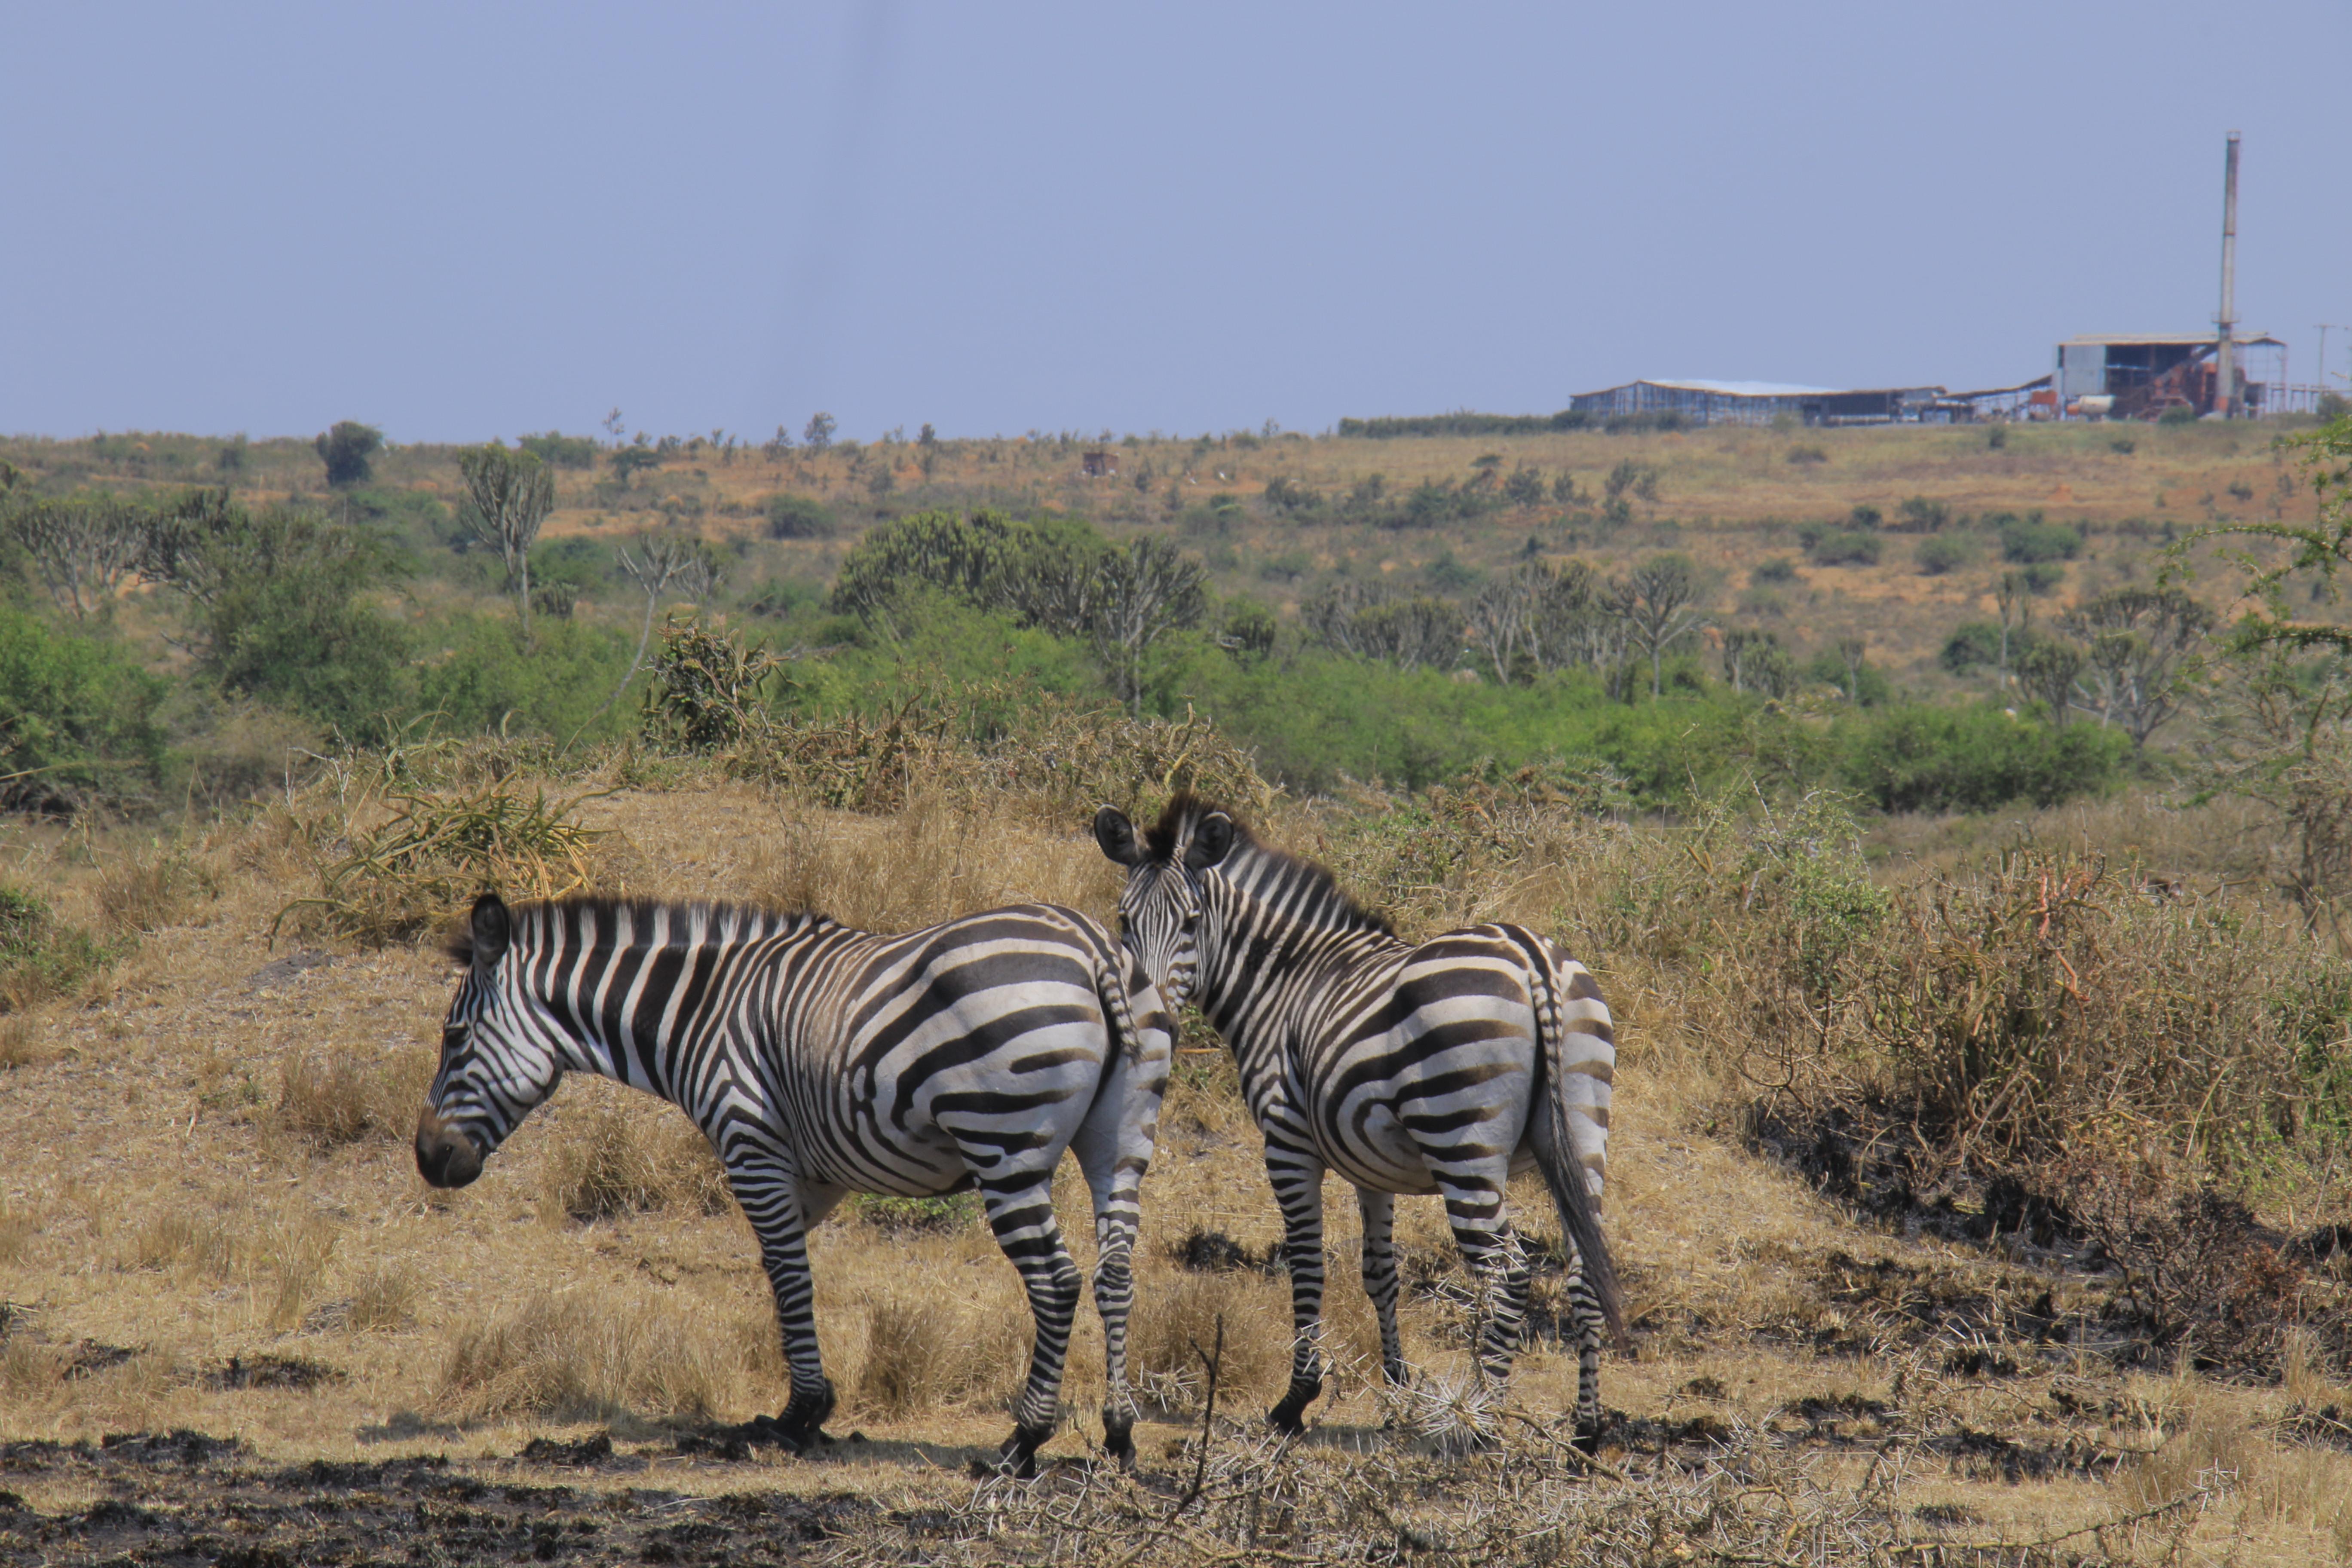 10 Days Road Trip to Encounter Gorillas & Wildlife in Uganda Tour 5